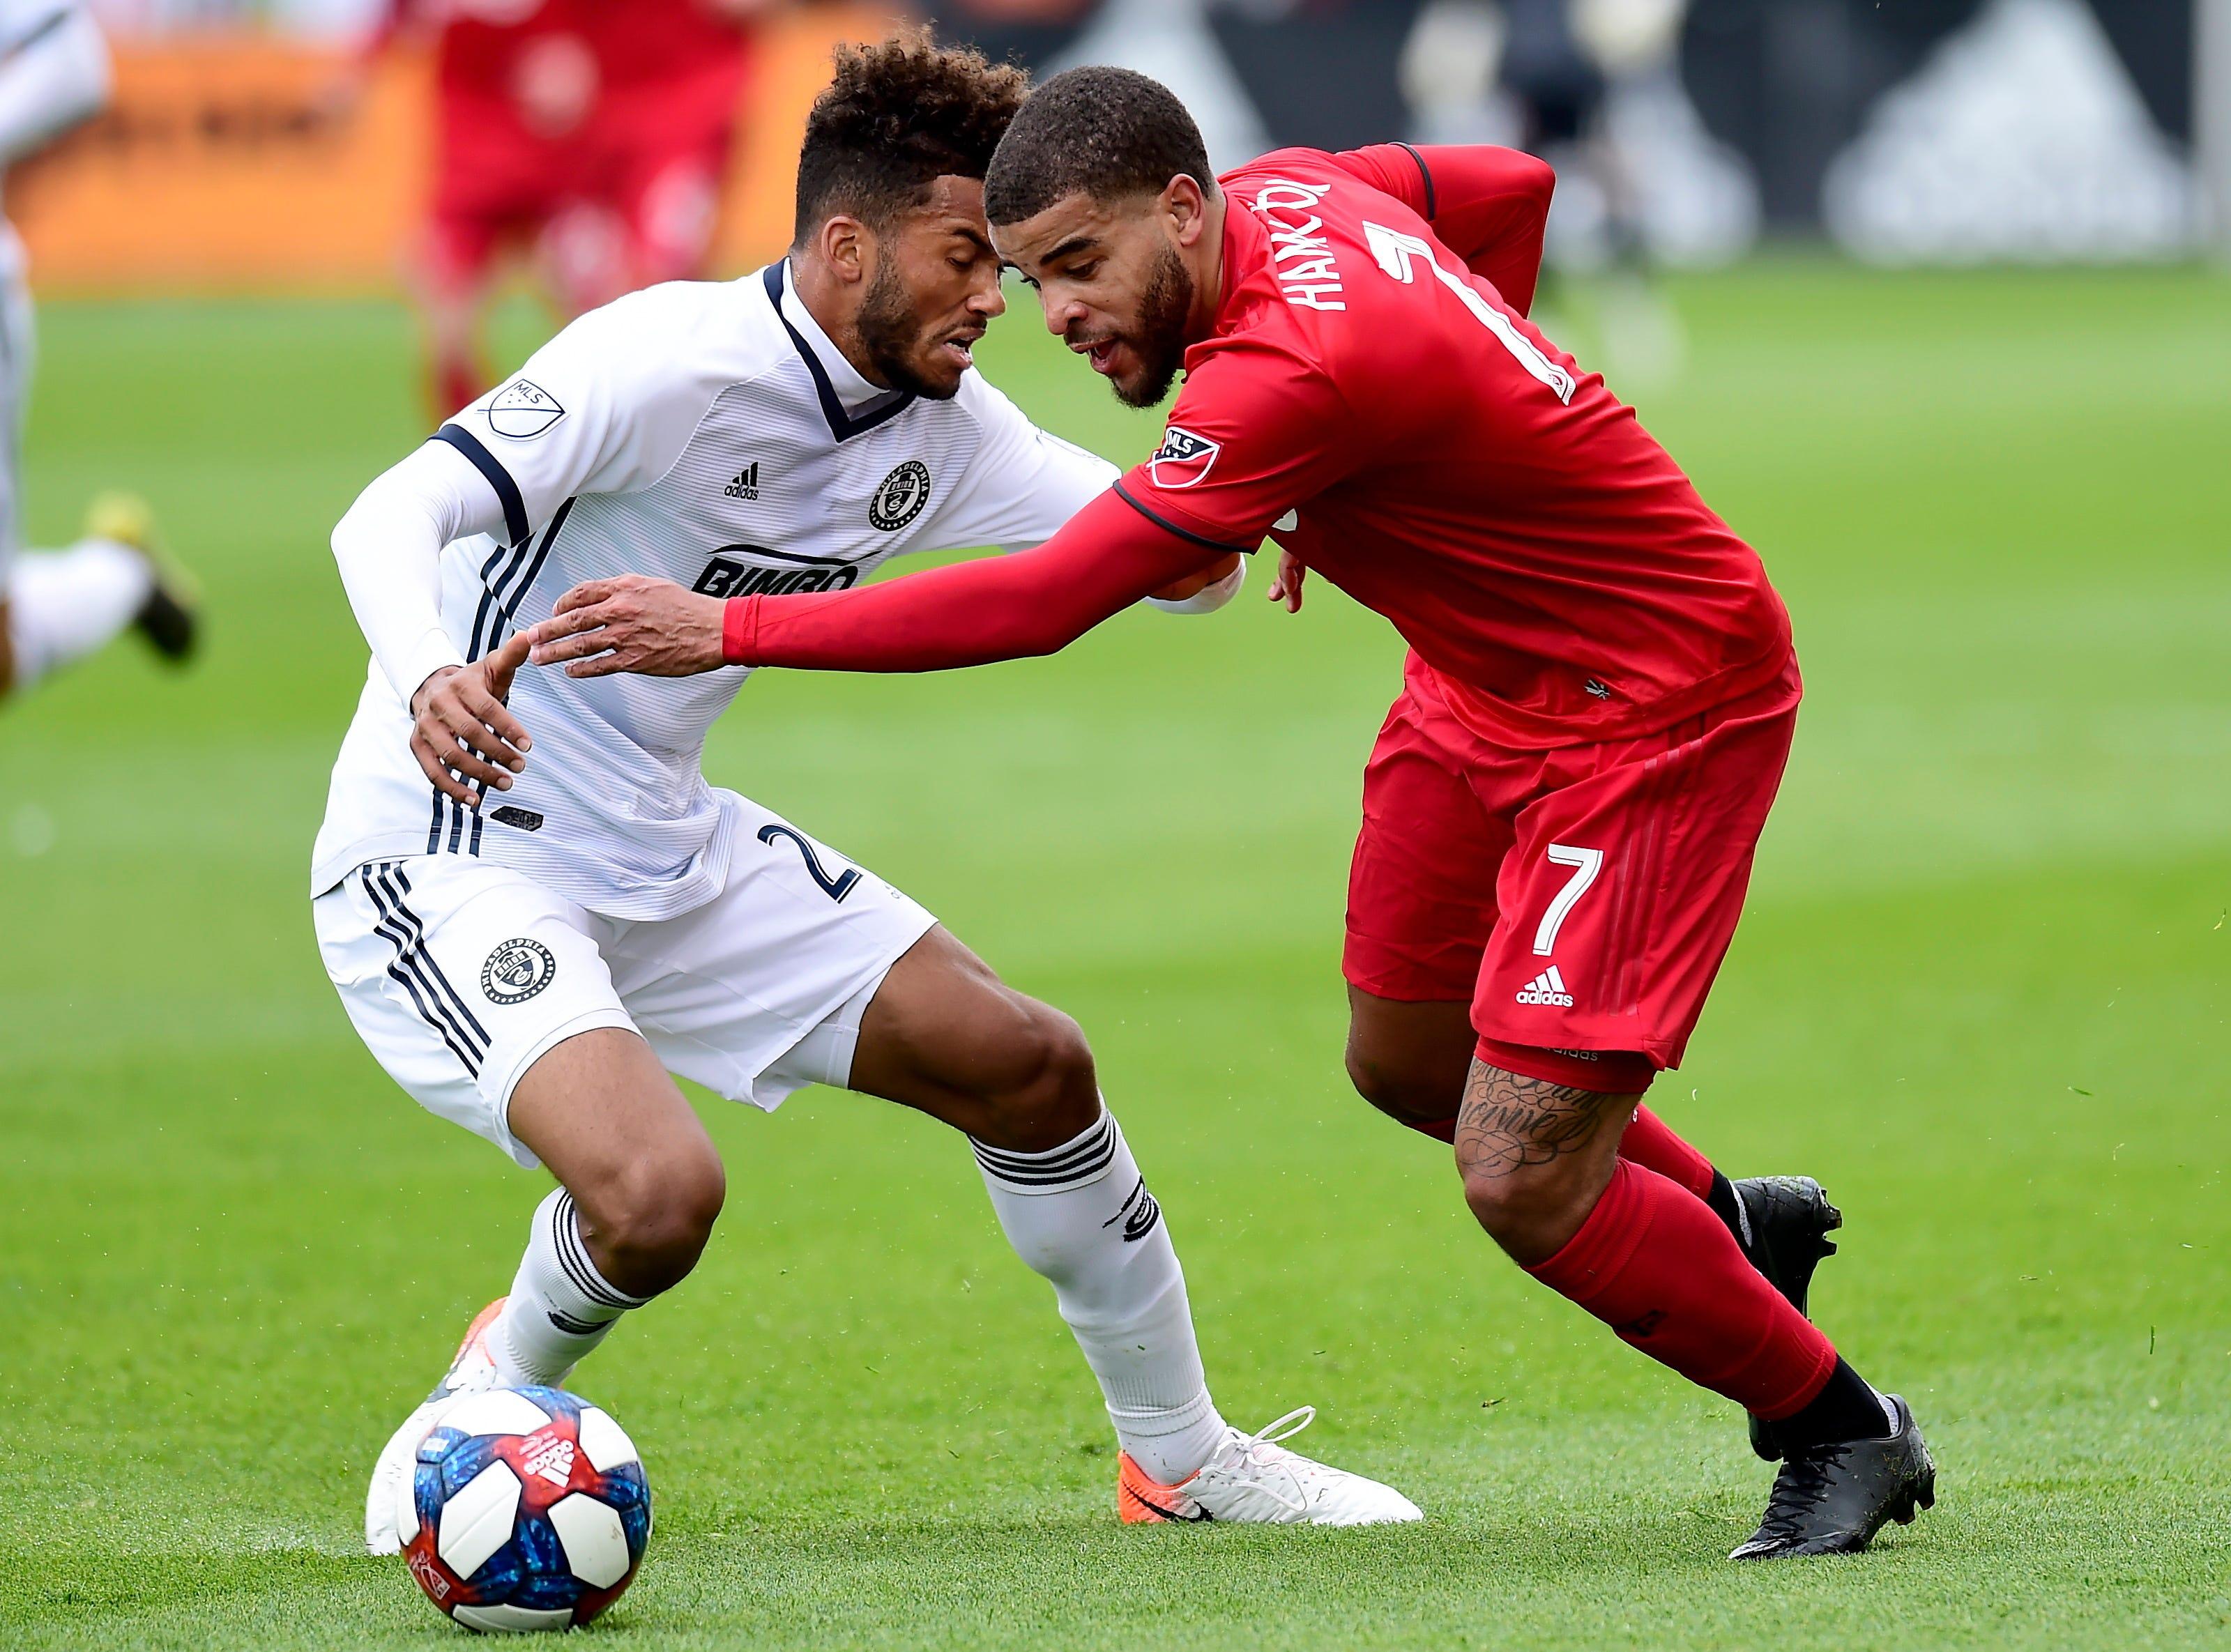 Monteiro breaks tie in 68th, Philadelphia beats Toronto 2-1